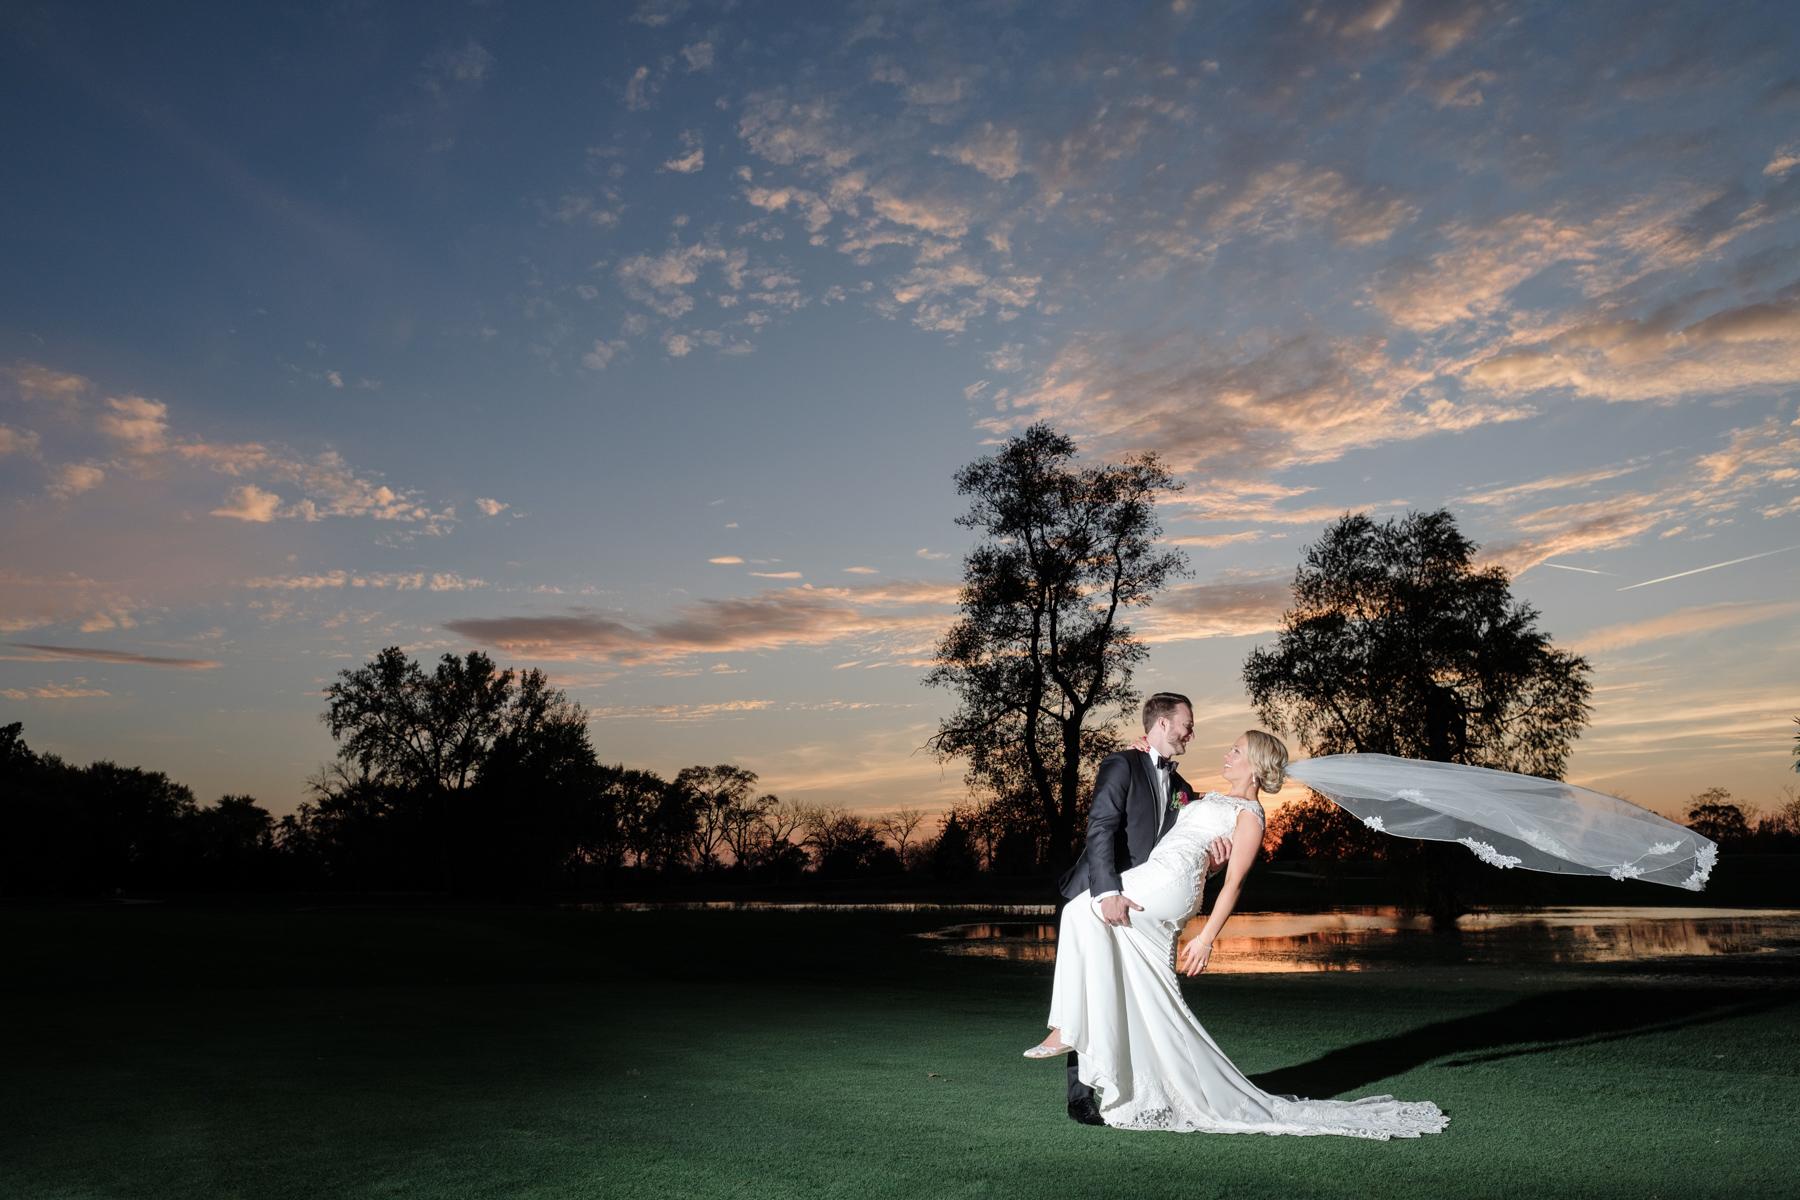 2017_BAP_KalliMatt_Gleneagles_CountryClub_Lemont_Wedding-64.jpg